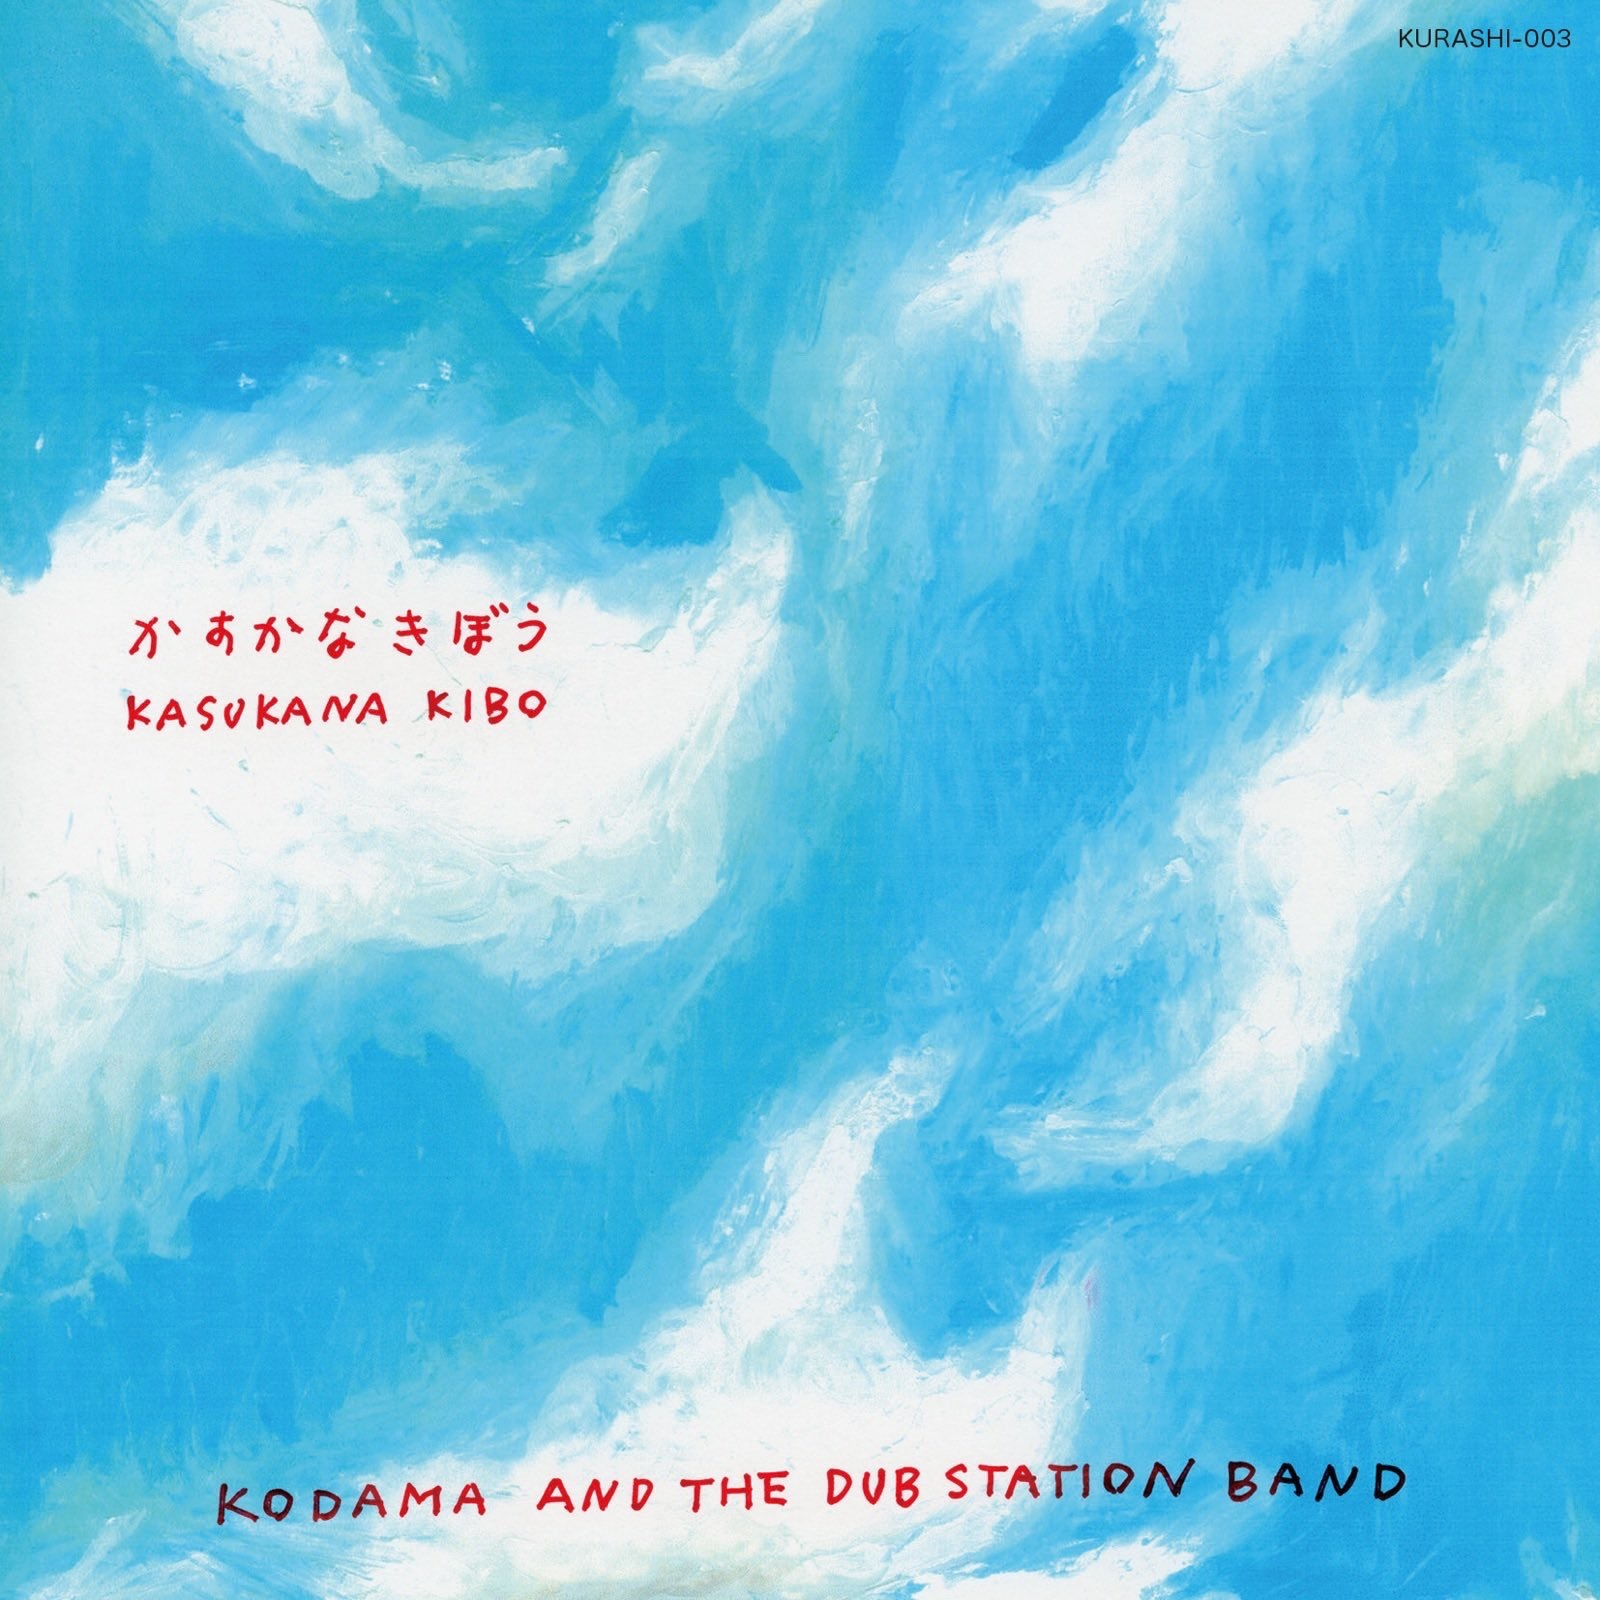 2019/11/20 KODAMA AND THE DUB STATION BAND アルバム『かすかな きぼう』リリース_f0140623_14503110.jpeg